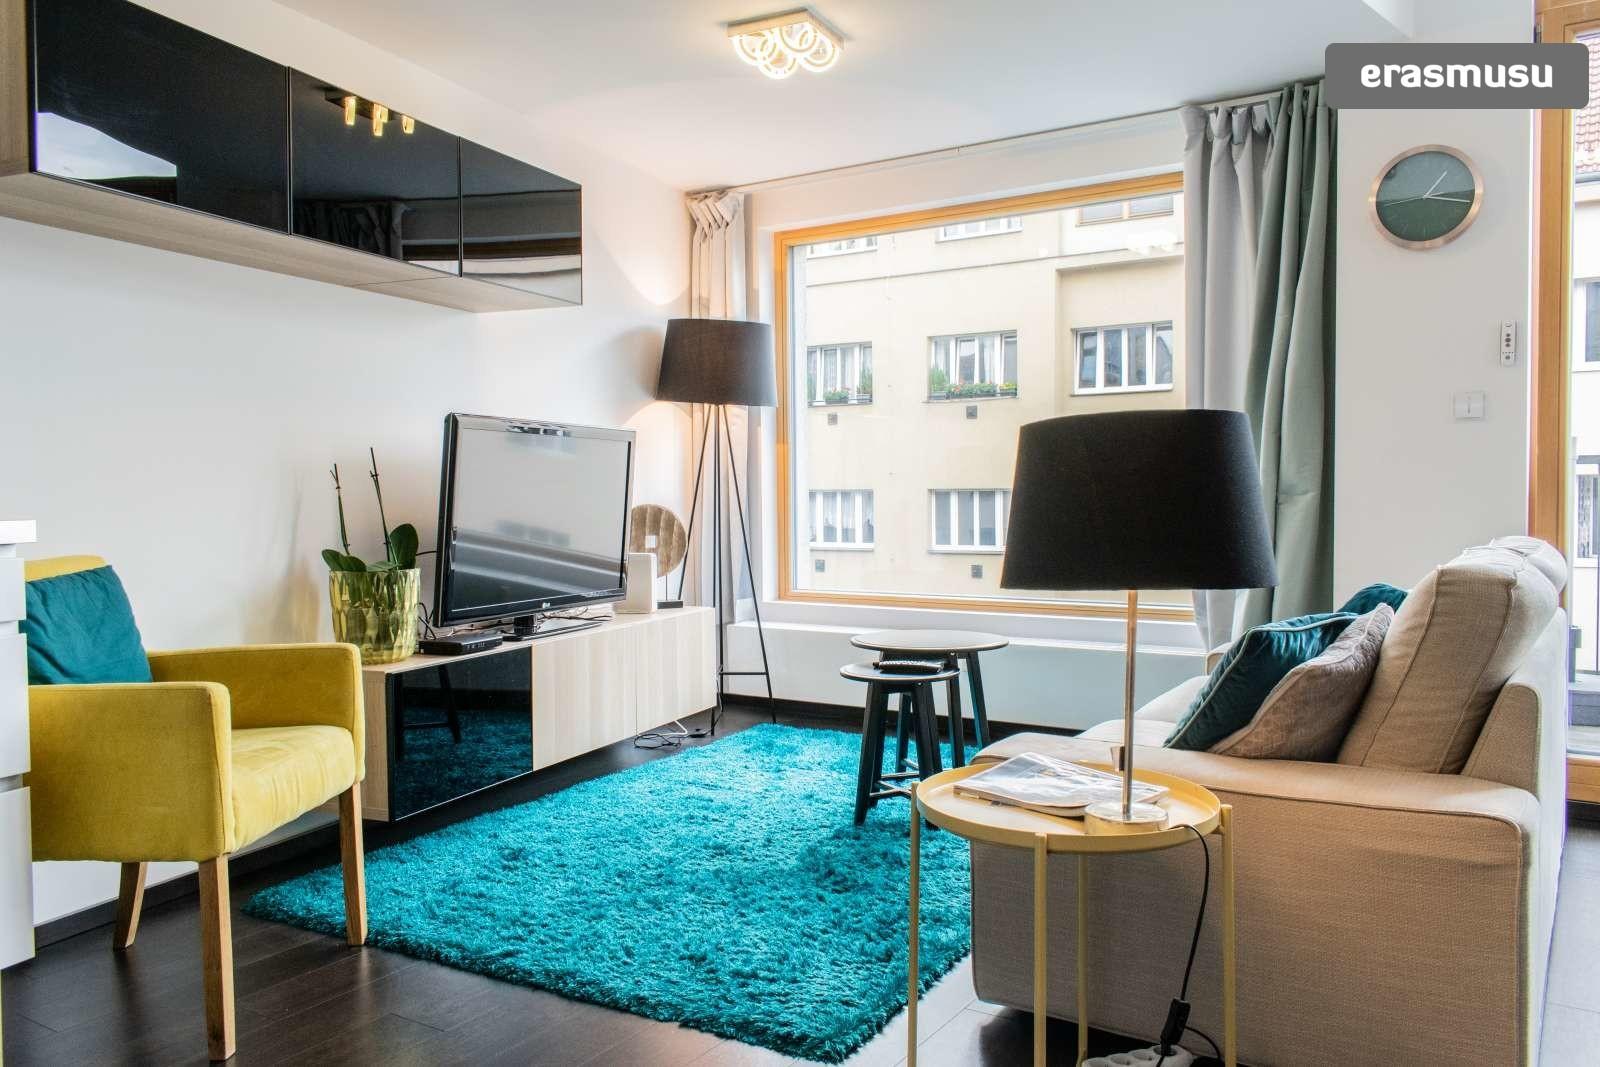 Modern Studio Apartment With Balcony For Rent In Prague 8 Rent Studios Prague